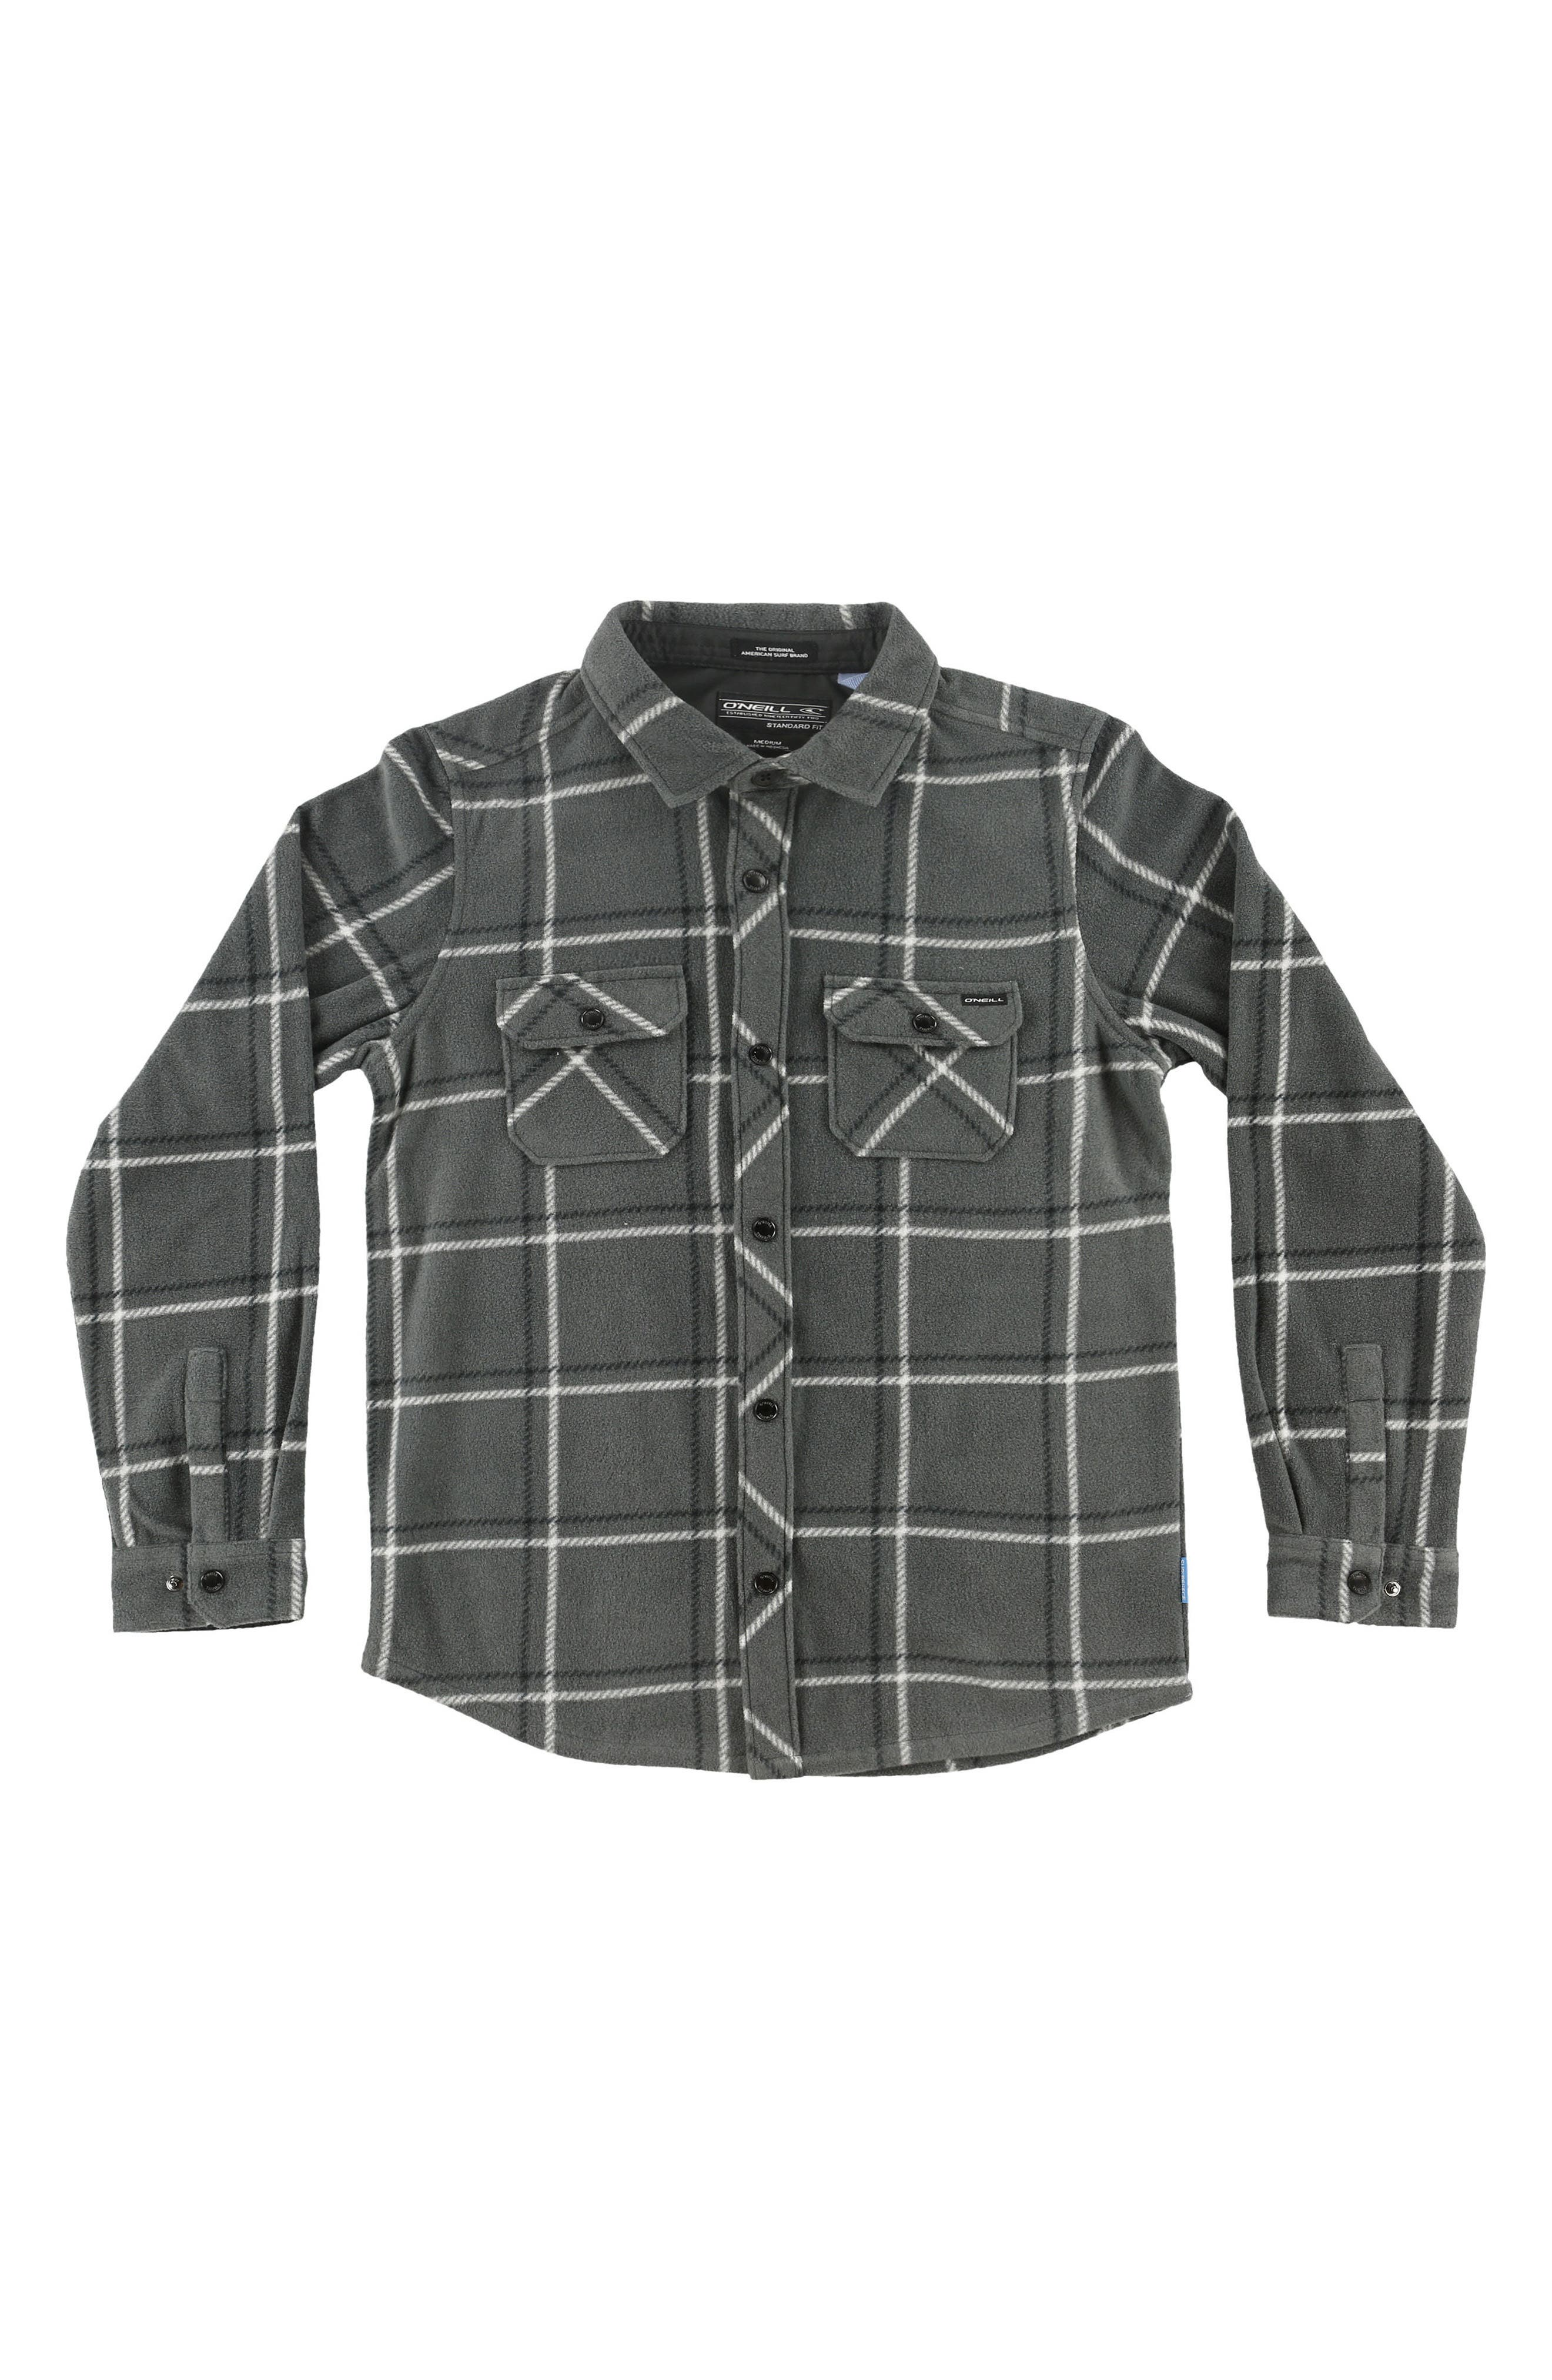 Alternate Image 1 Selected - O'Neill Glacier Series Two Plush Windowpane Shirt (Toddler Boys)